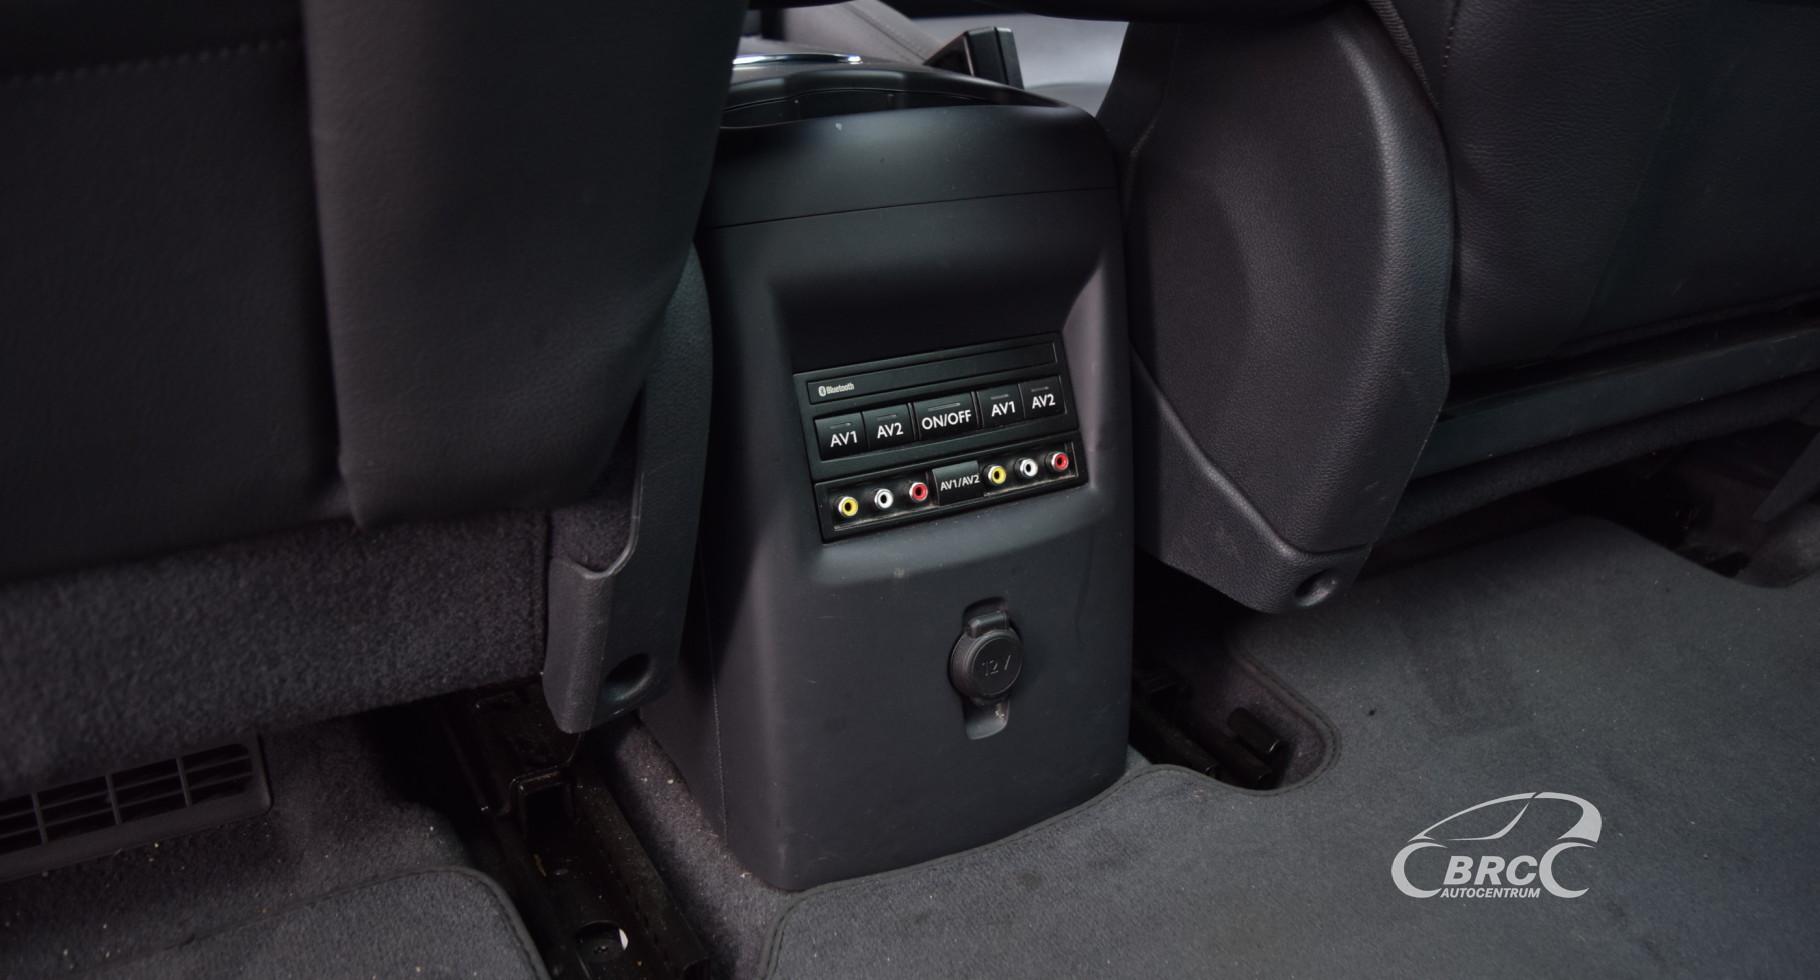 Peugeot 5008 e-HDi A/T 7 seats